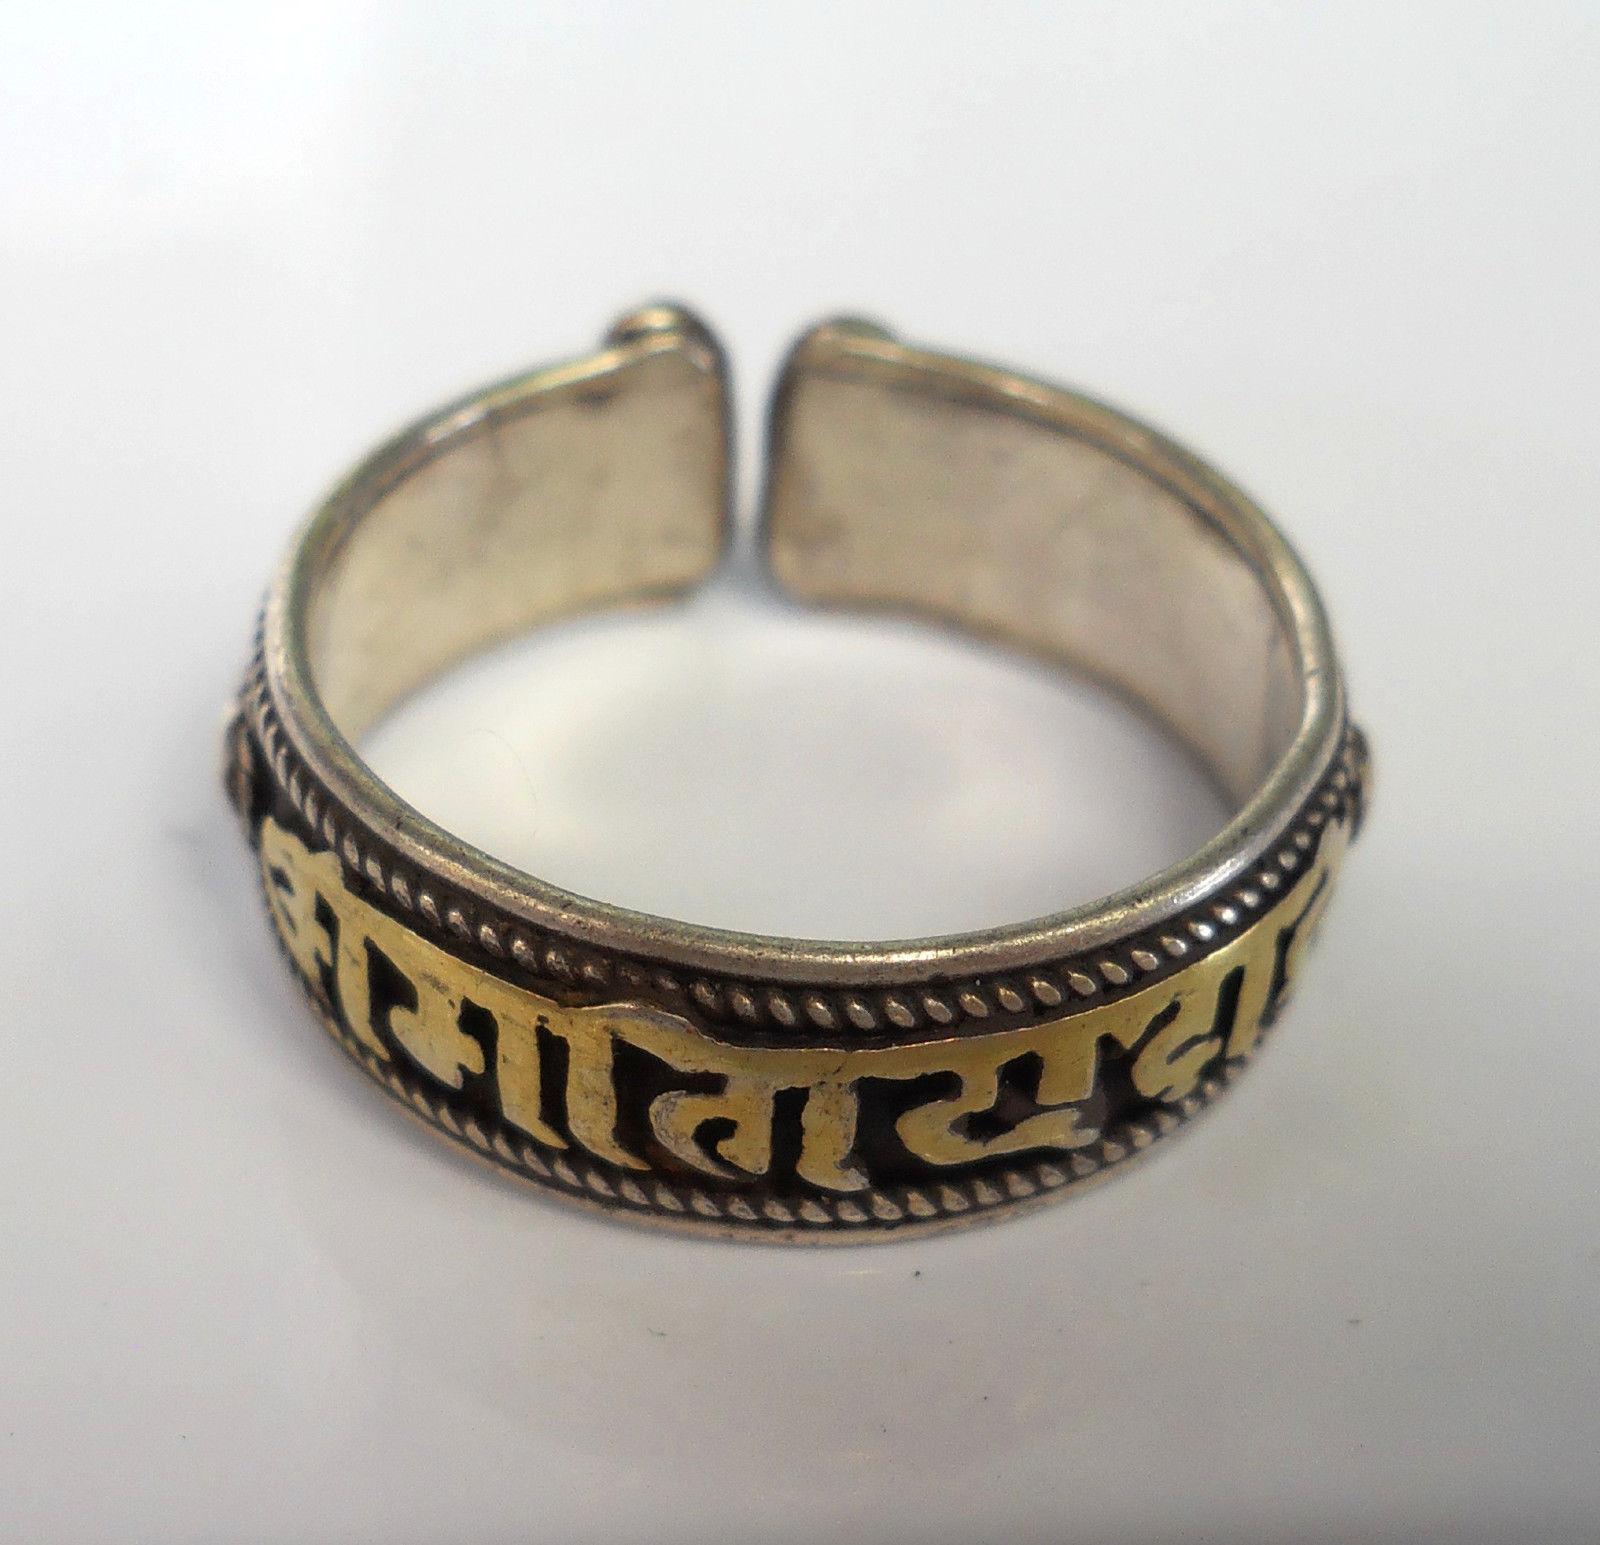 TIBETAN BUDDHIST MANTRA RING